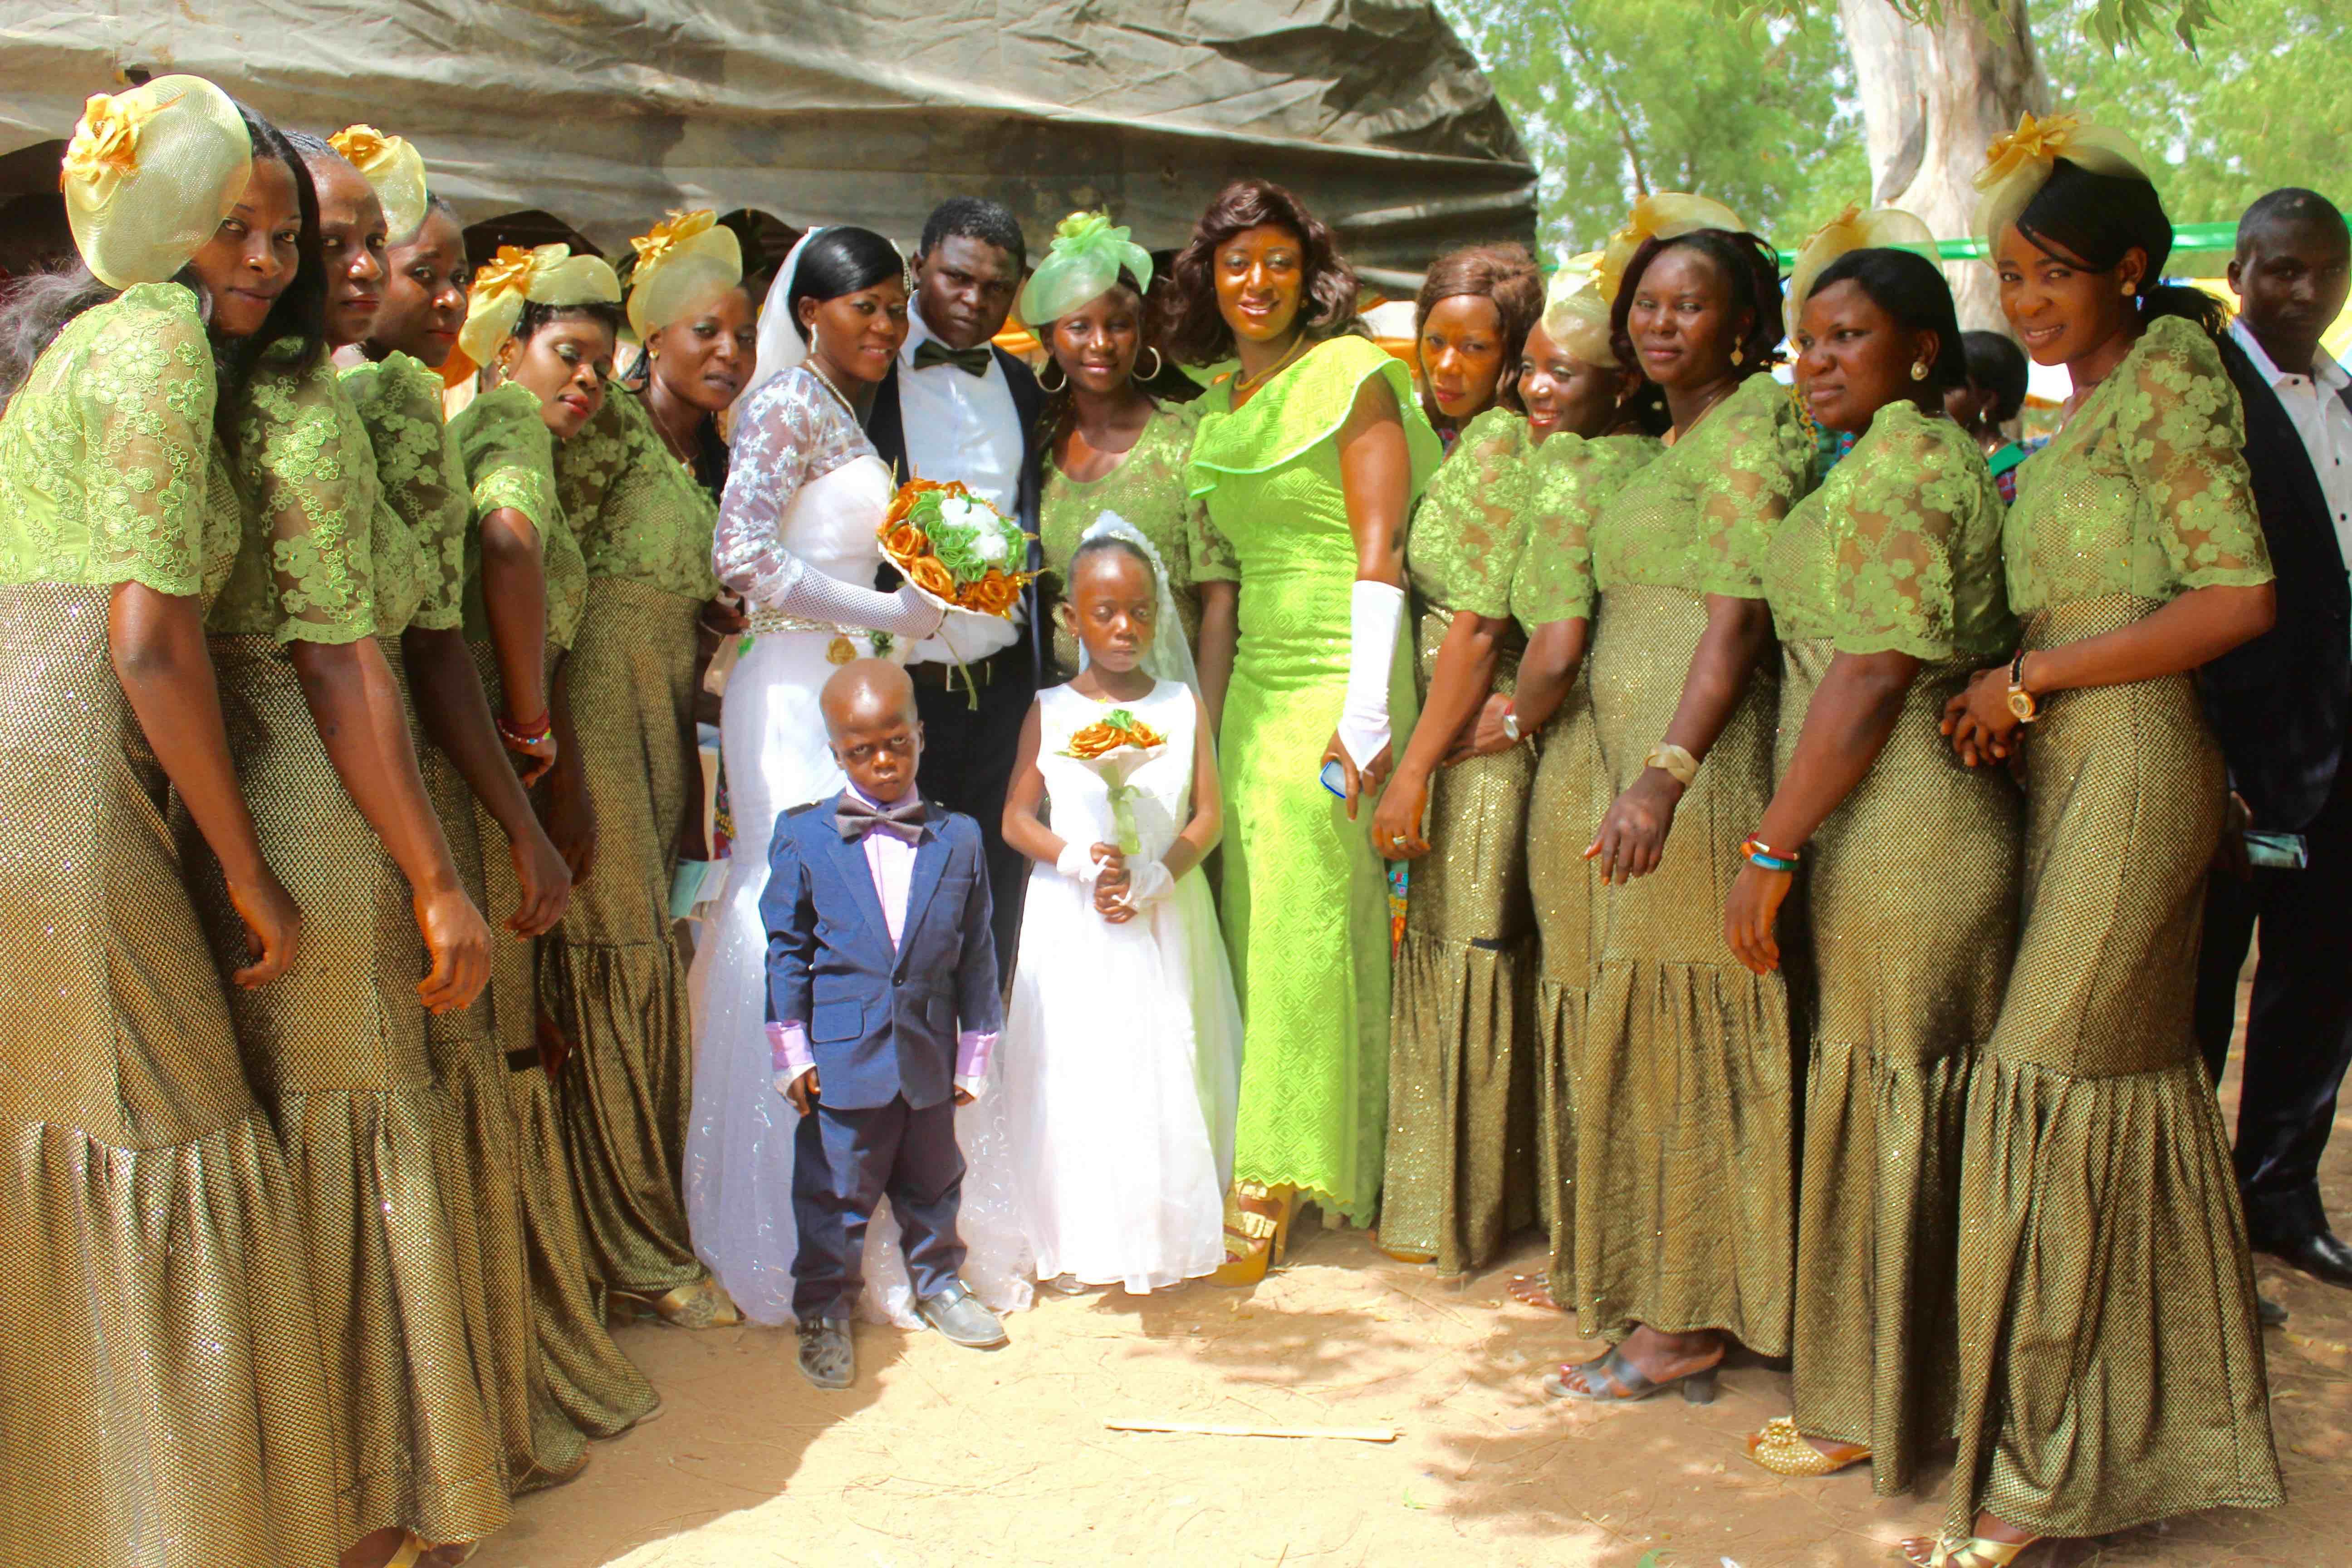 Nigerian Wedding (Bridesmaids)